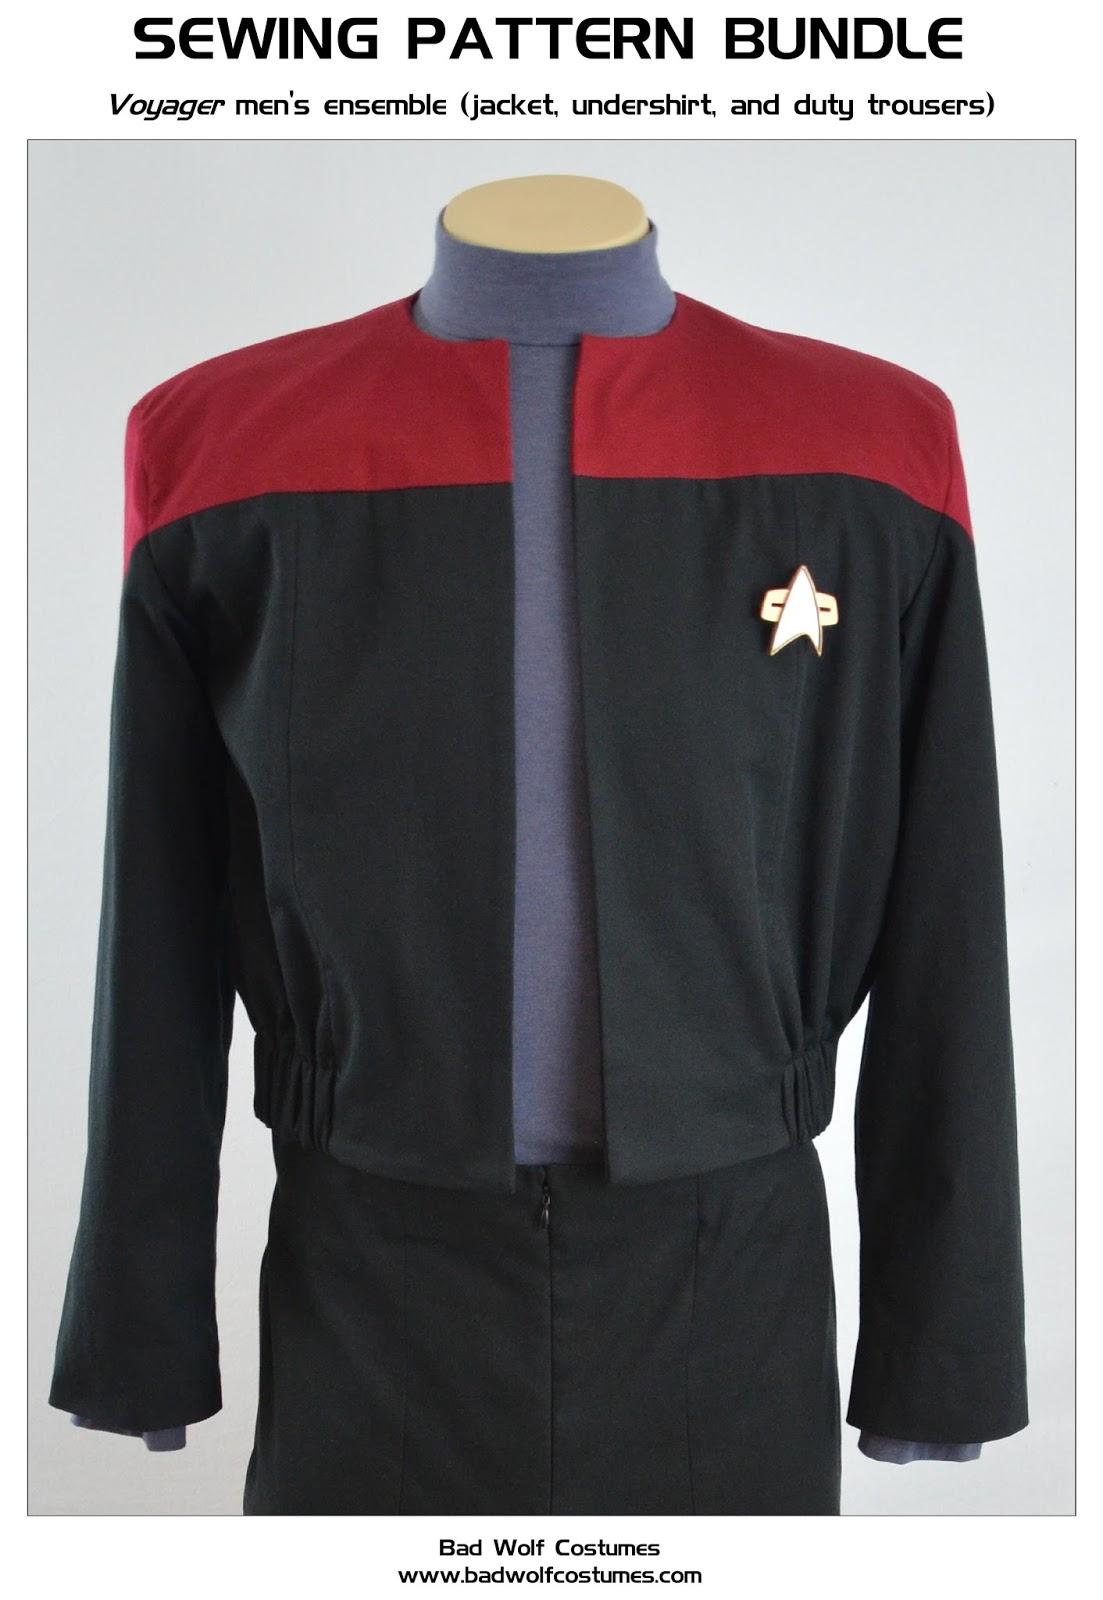 Bad Wolf Costumes: Star Trek: Voyager Uniform Bundle